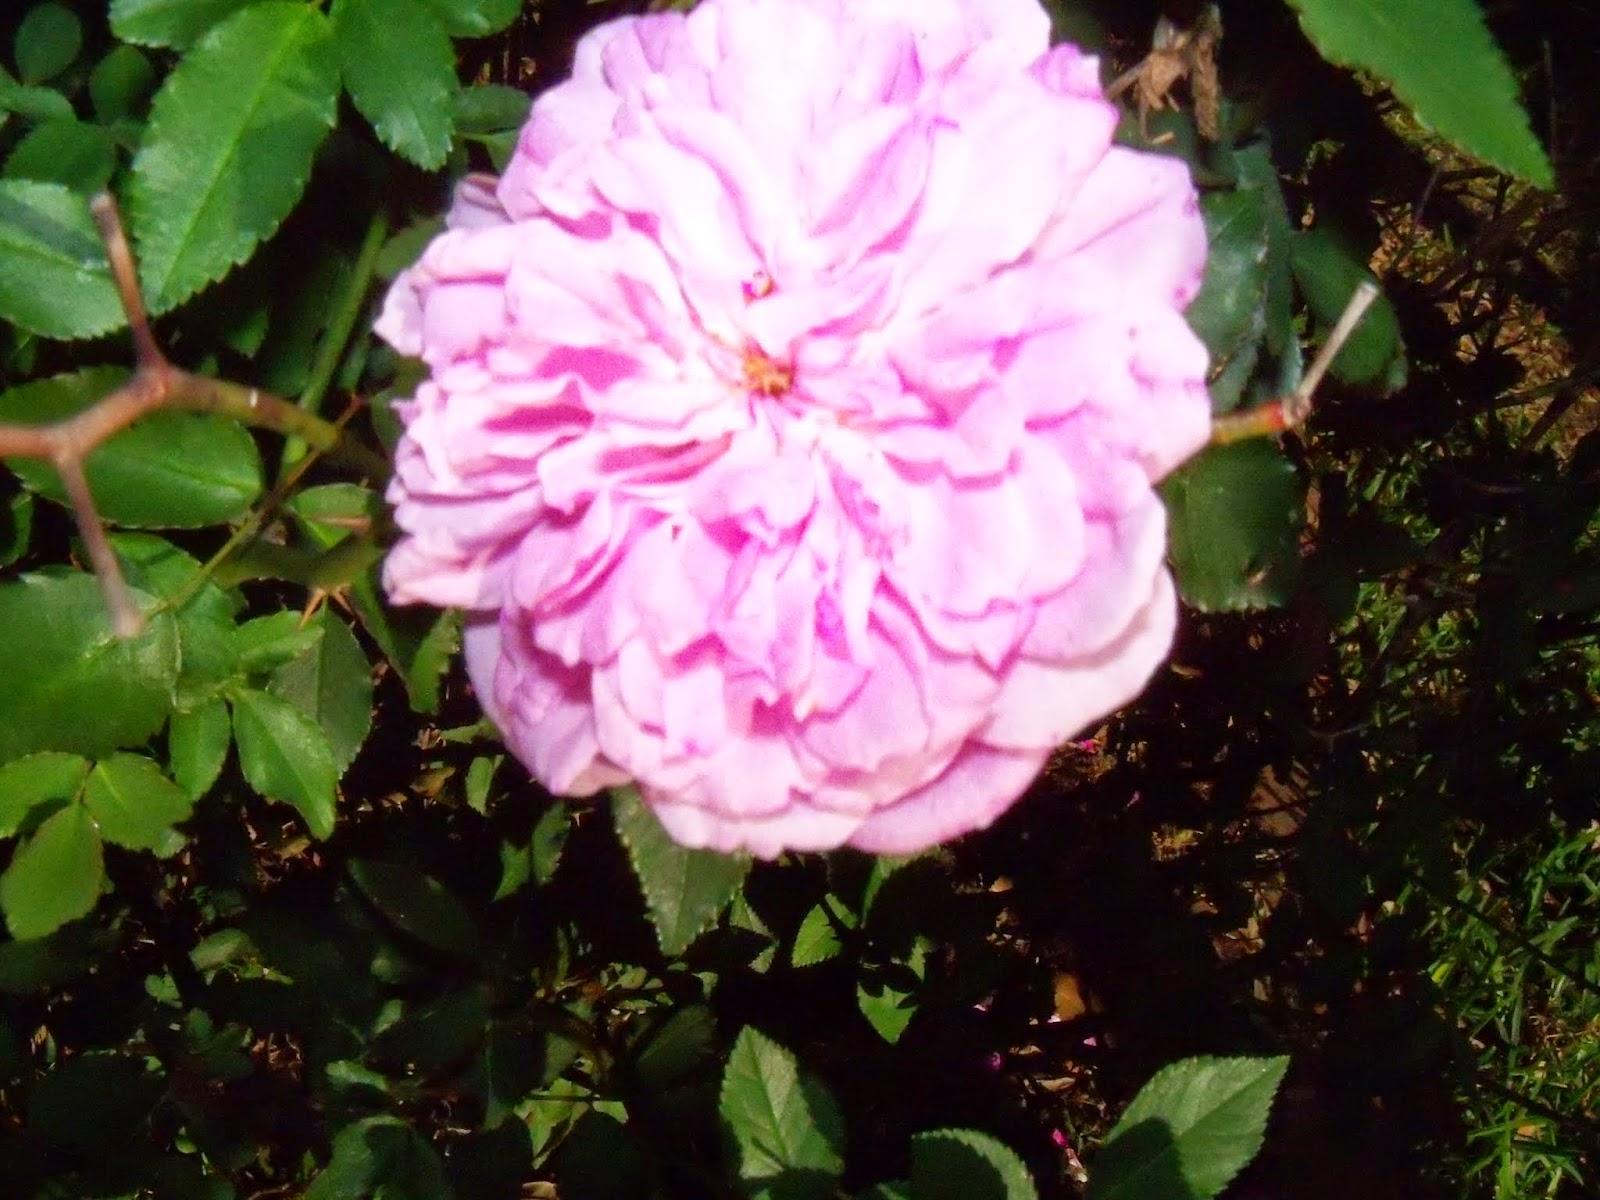 Gardening 2015 - 116_7634.JPG